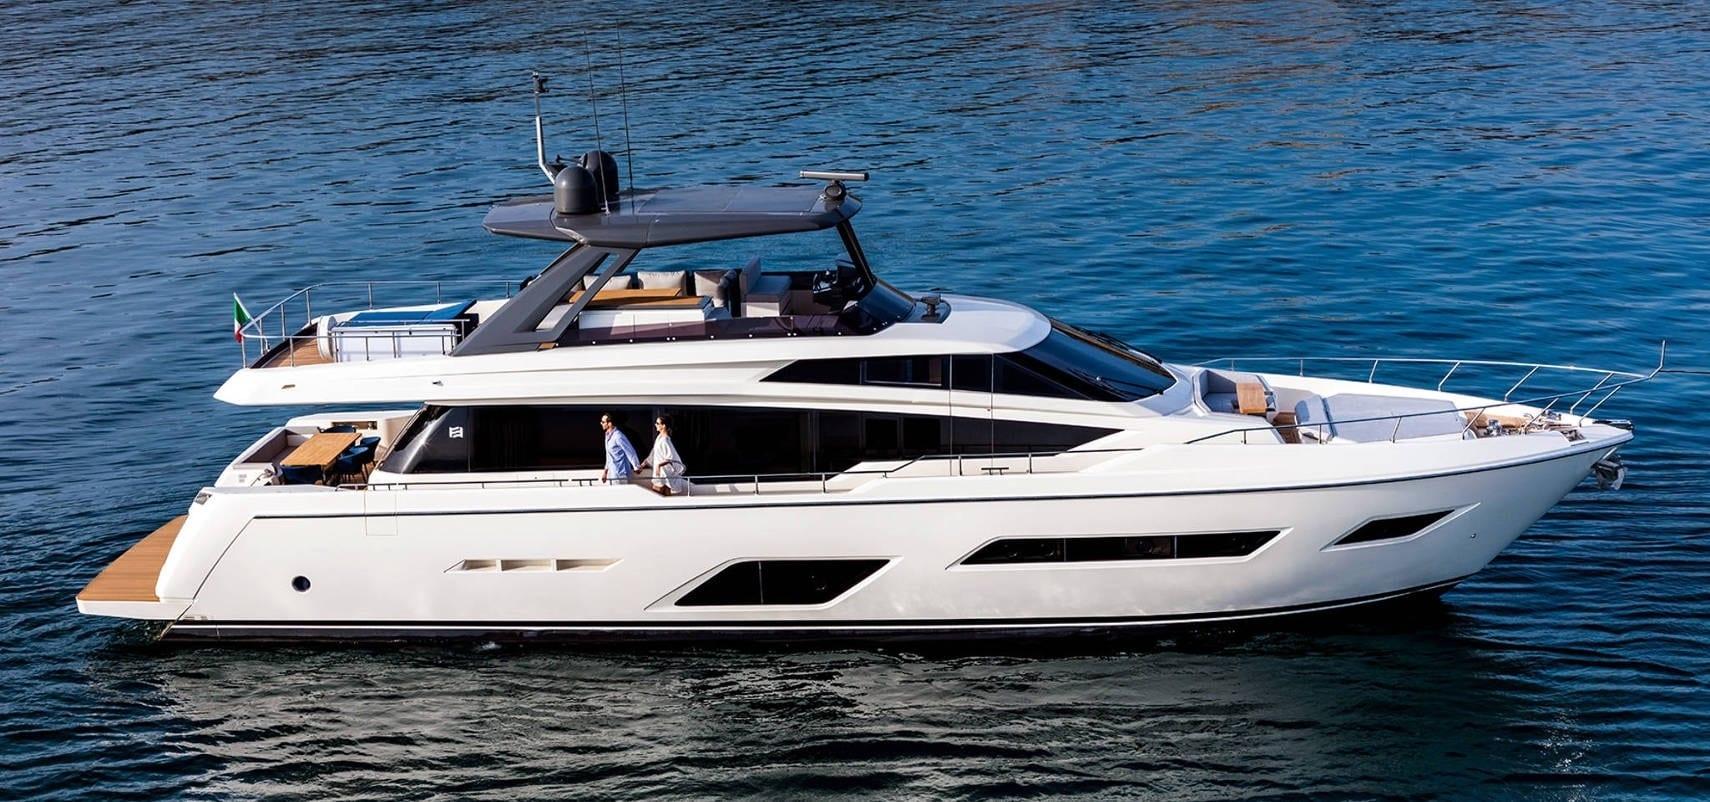 моторная яхта Feretti 24 метра на Адриатике